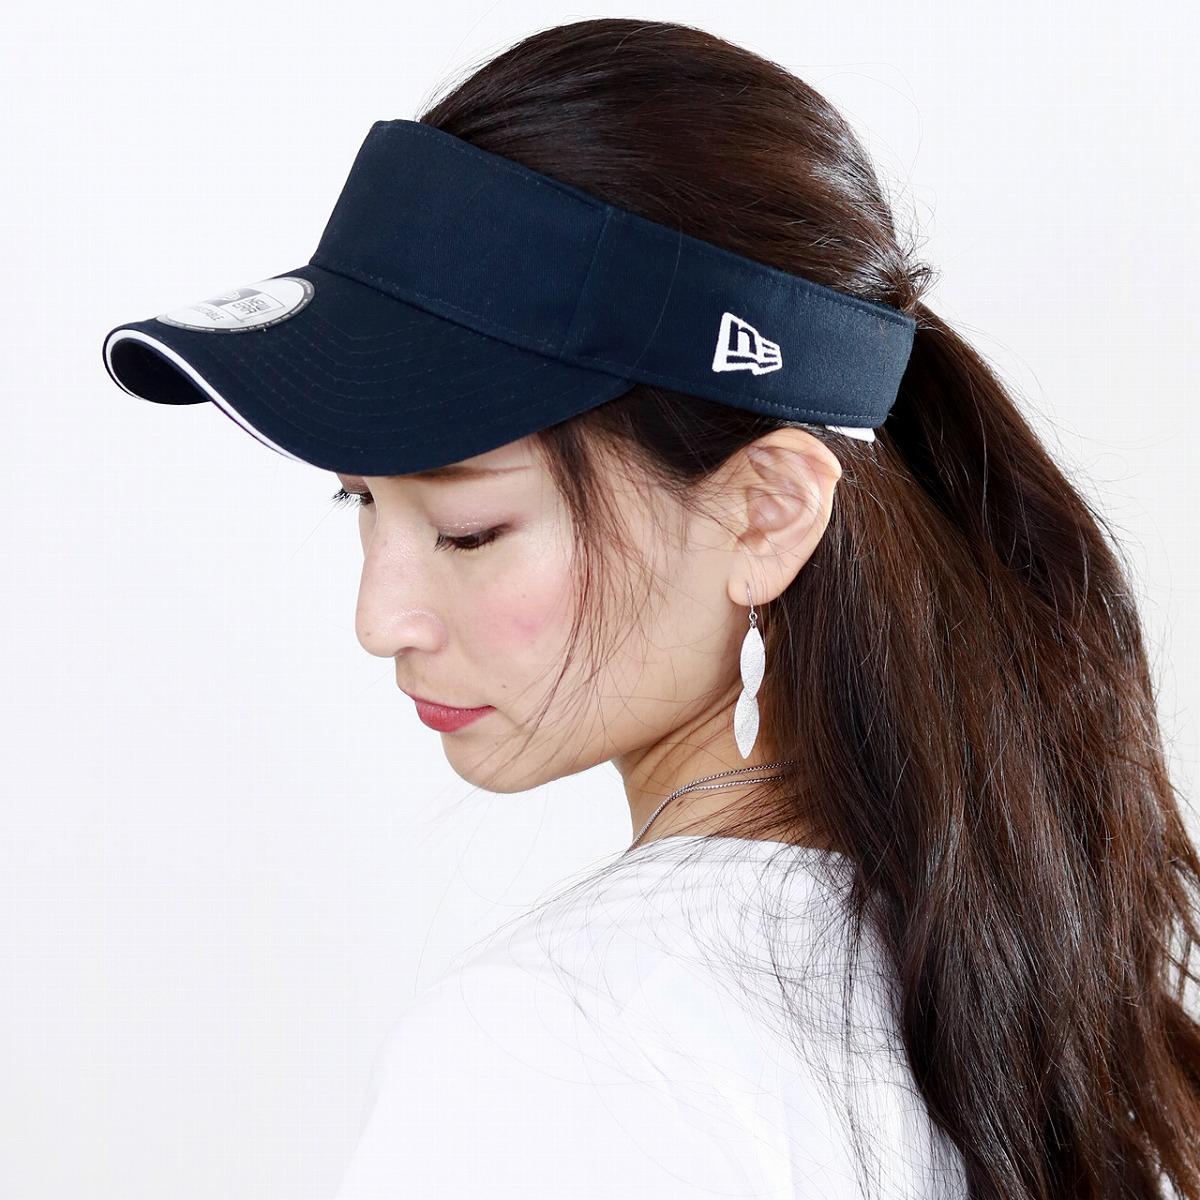 90278e78 ELEHELM HAT STORE: NEWERA oar season hat Lady's sun visor Lady's sports new  gills sun visor men UV measures walk / navy | Rakuten Global Market